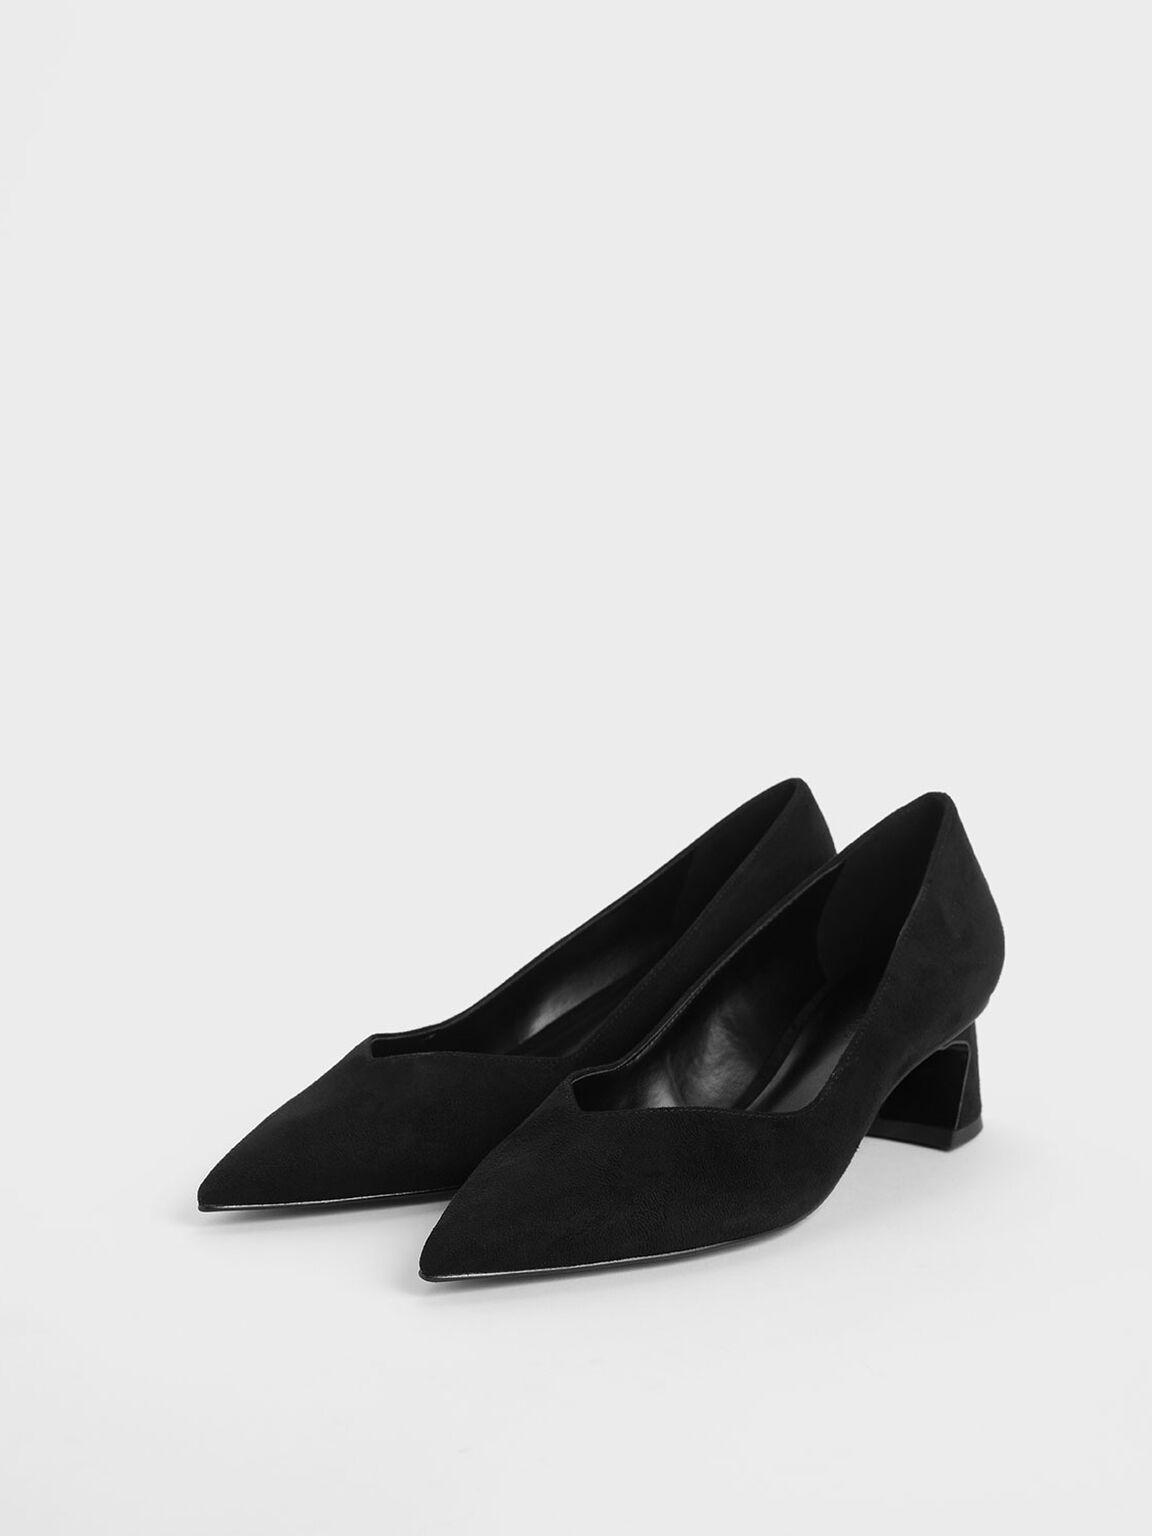 Curved Block Heel Textured Pumps, Black, hi-res